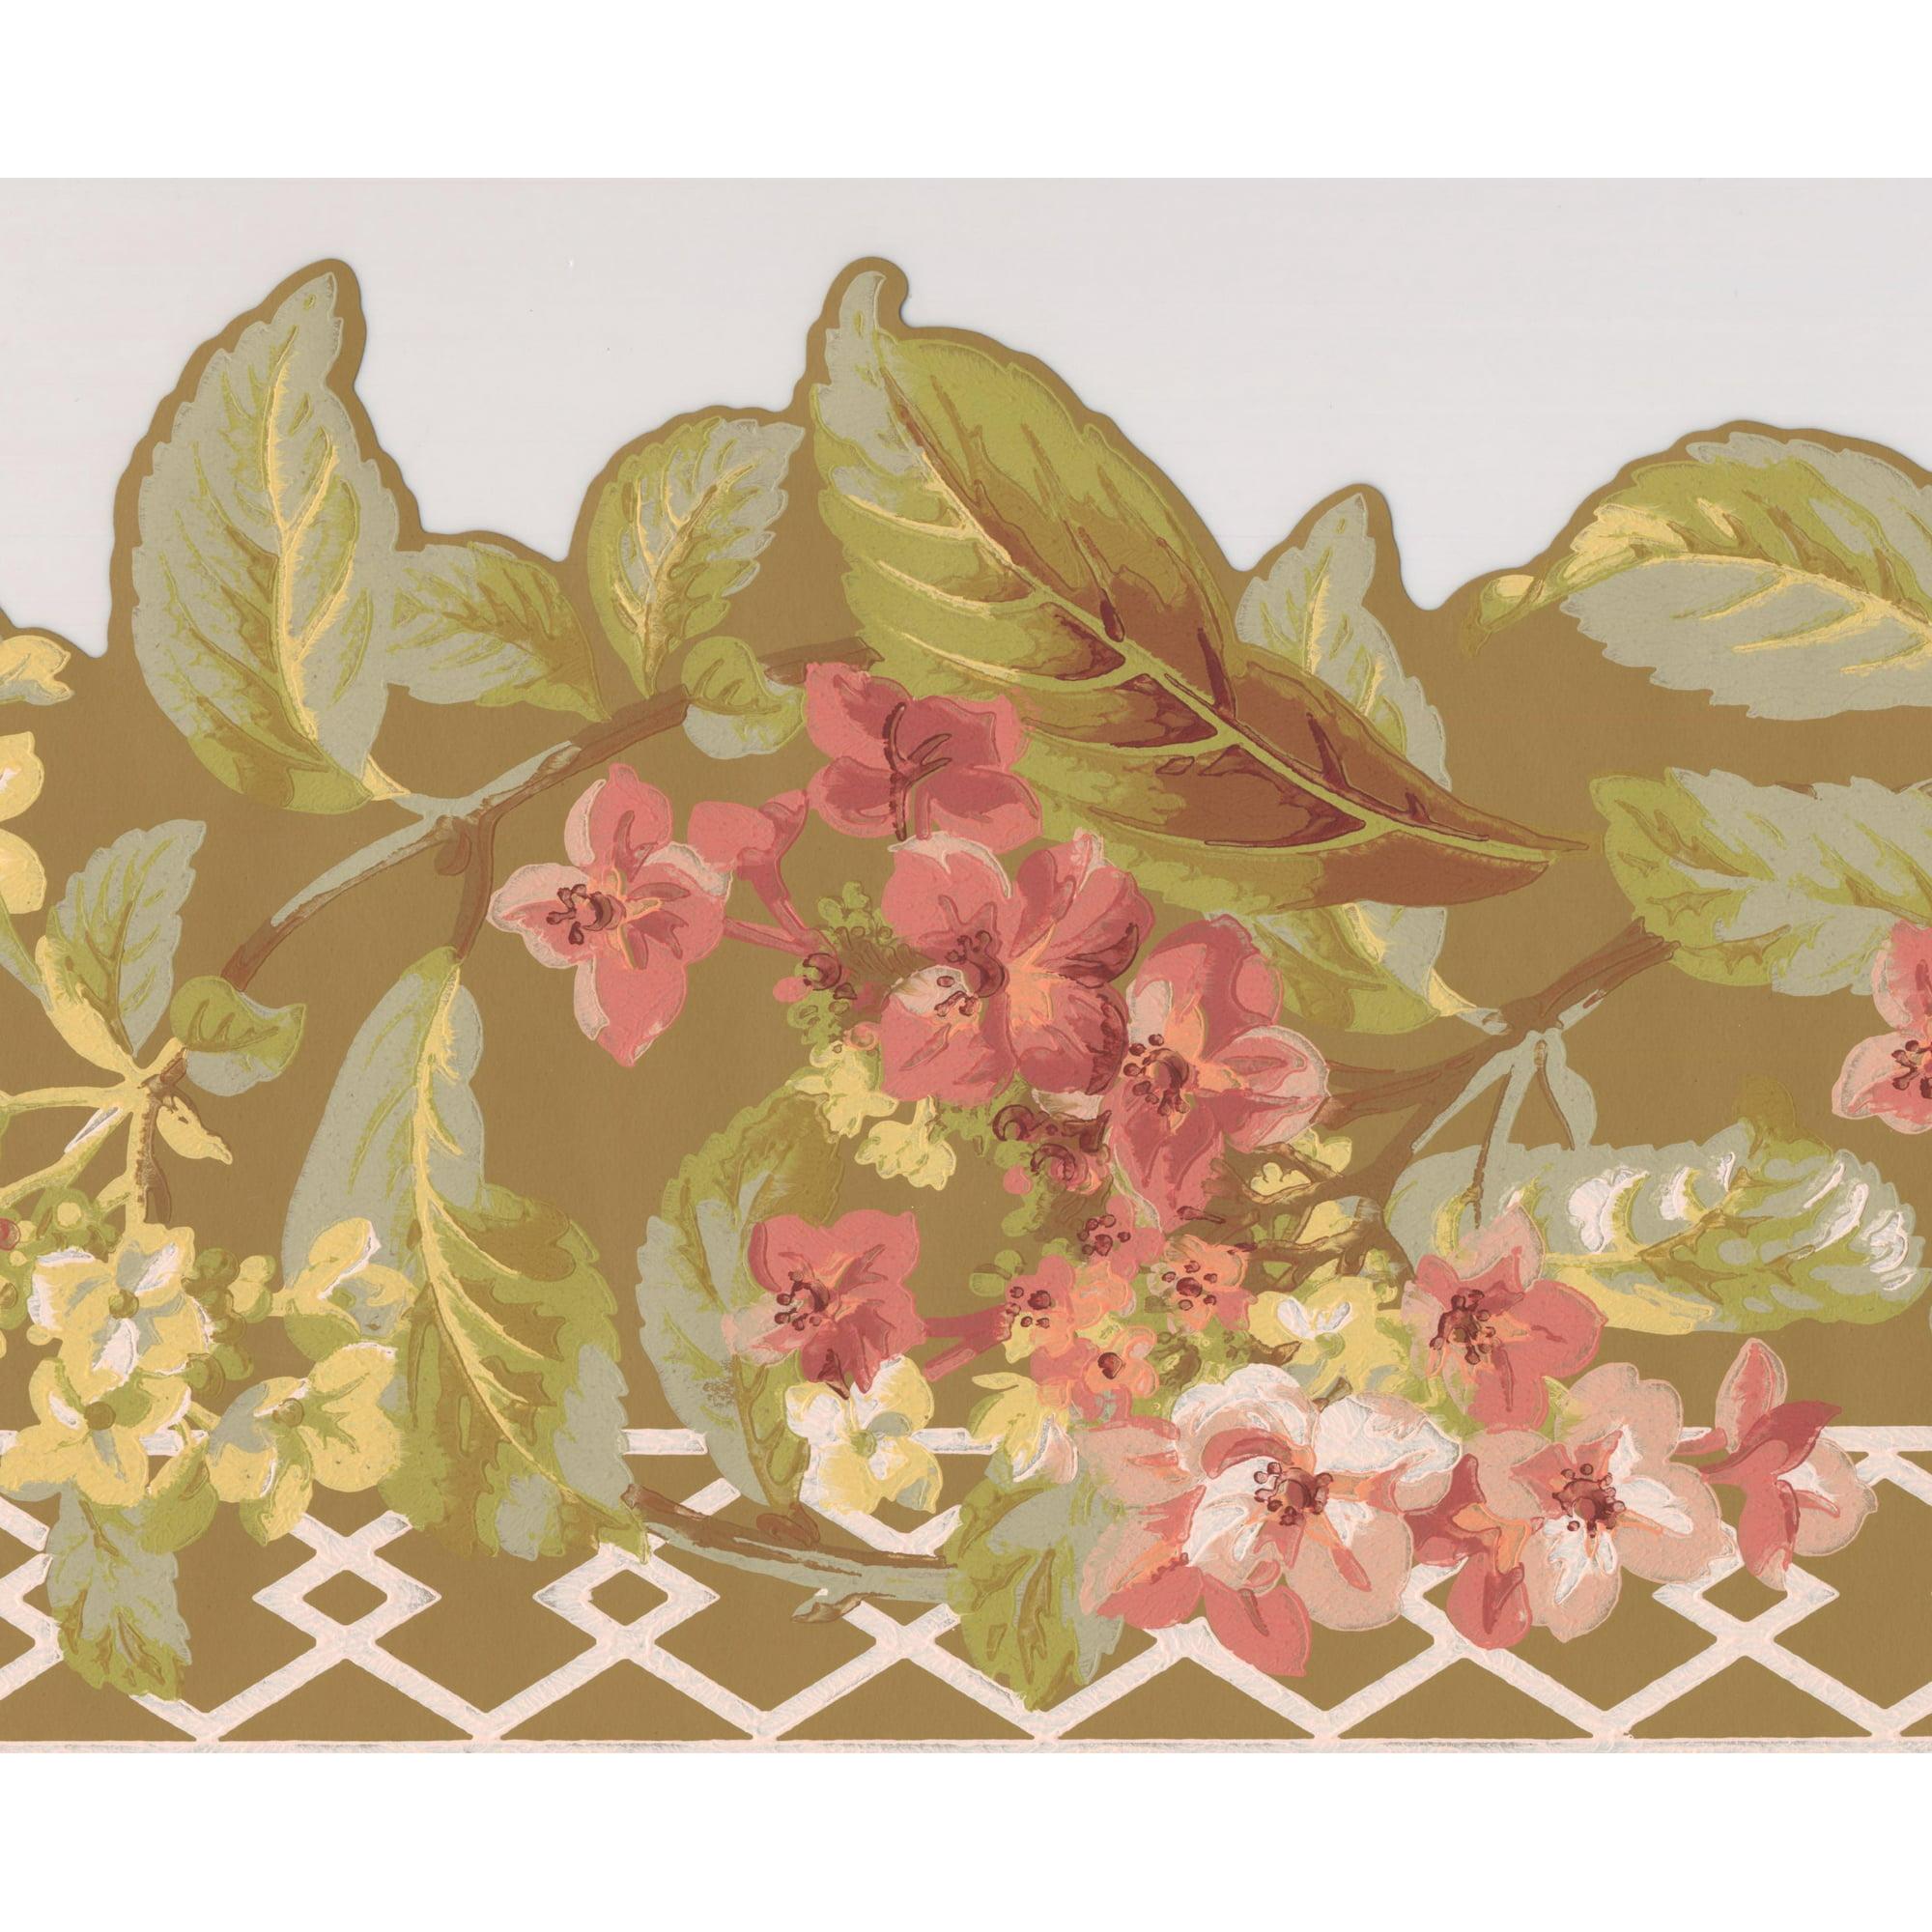 Red Yellow Flowers Mustard Floral Wallpaper Border Retro Design